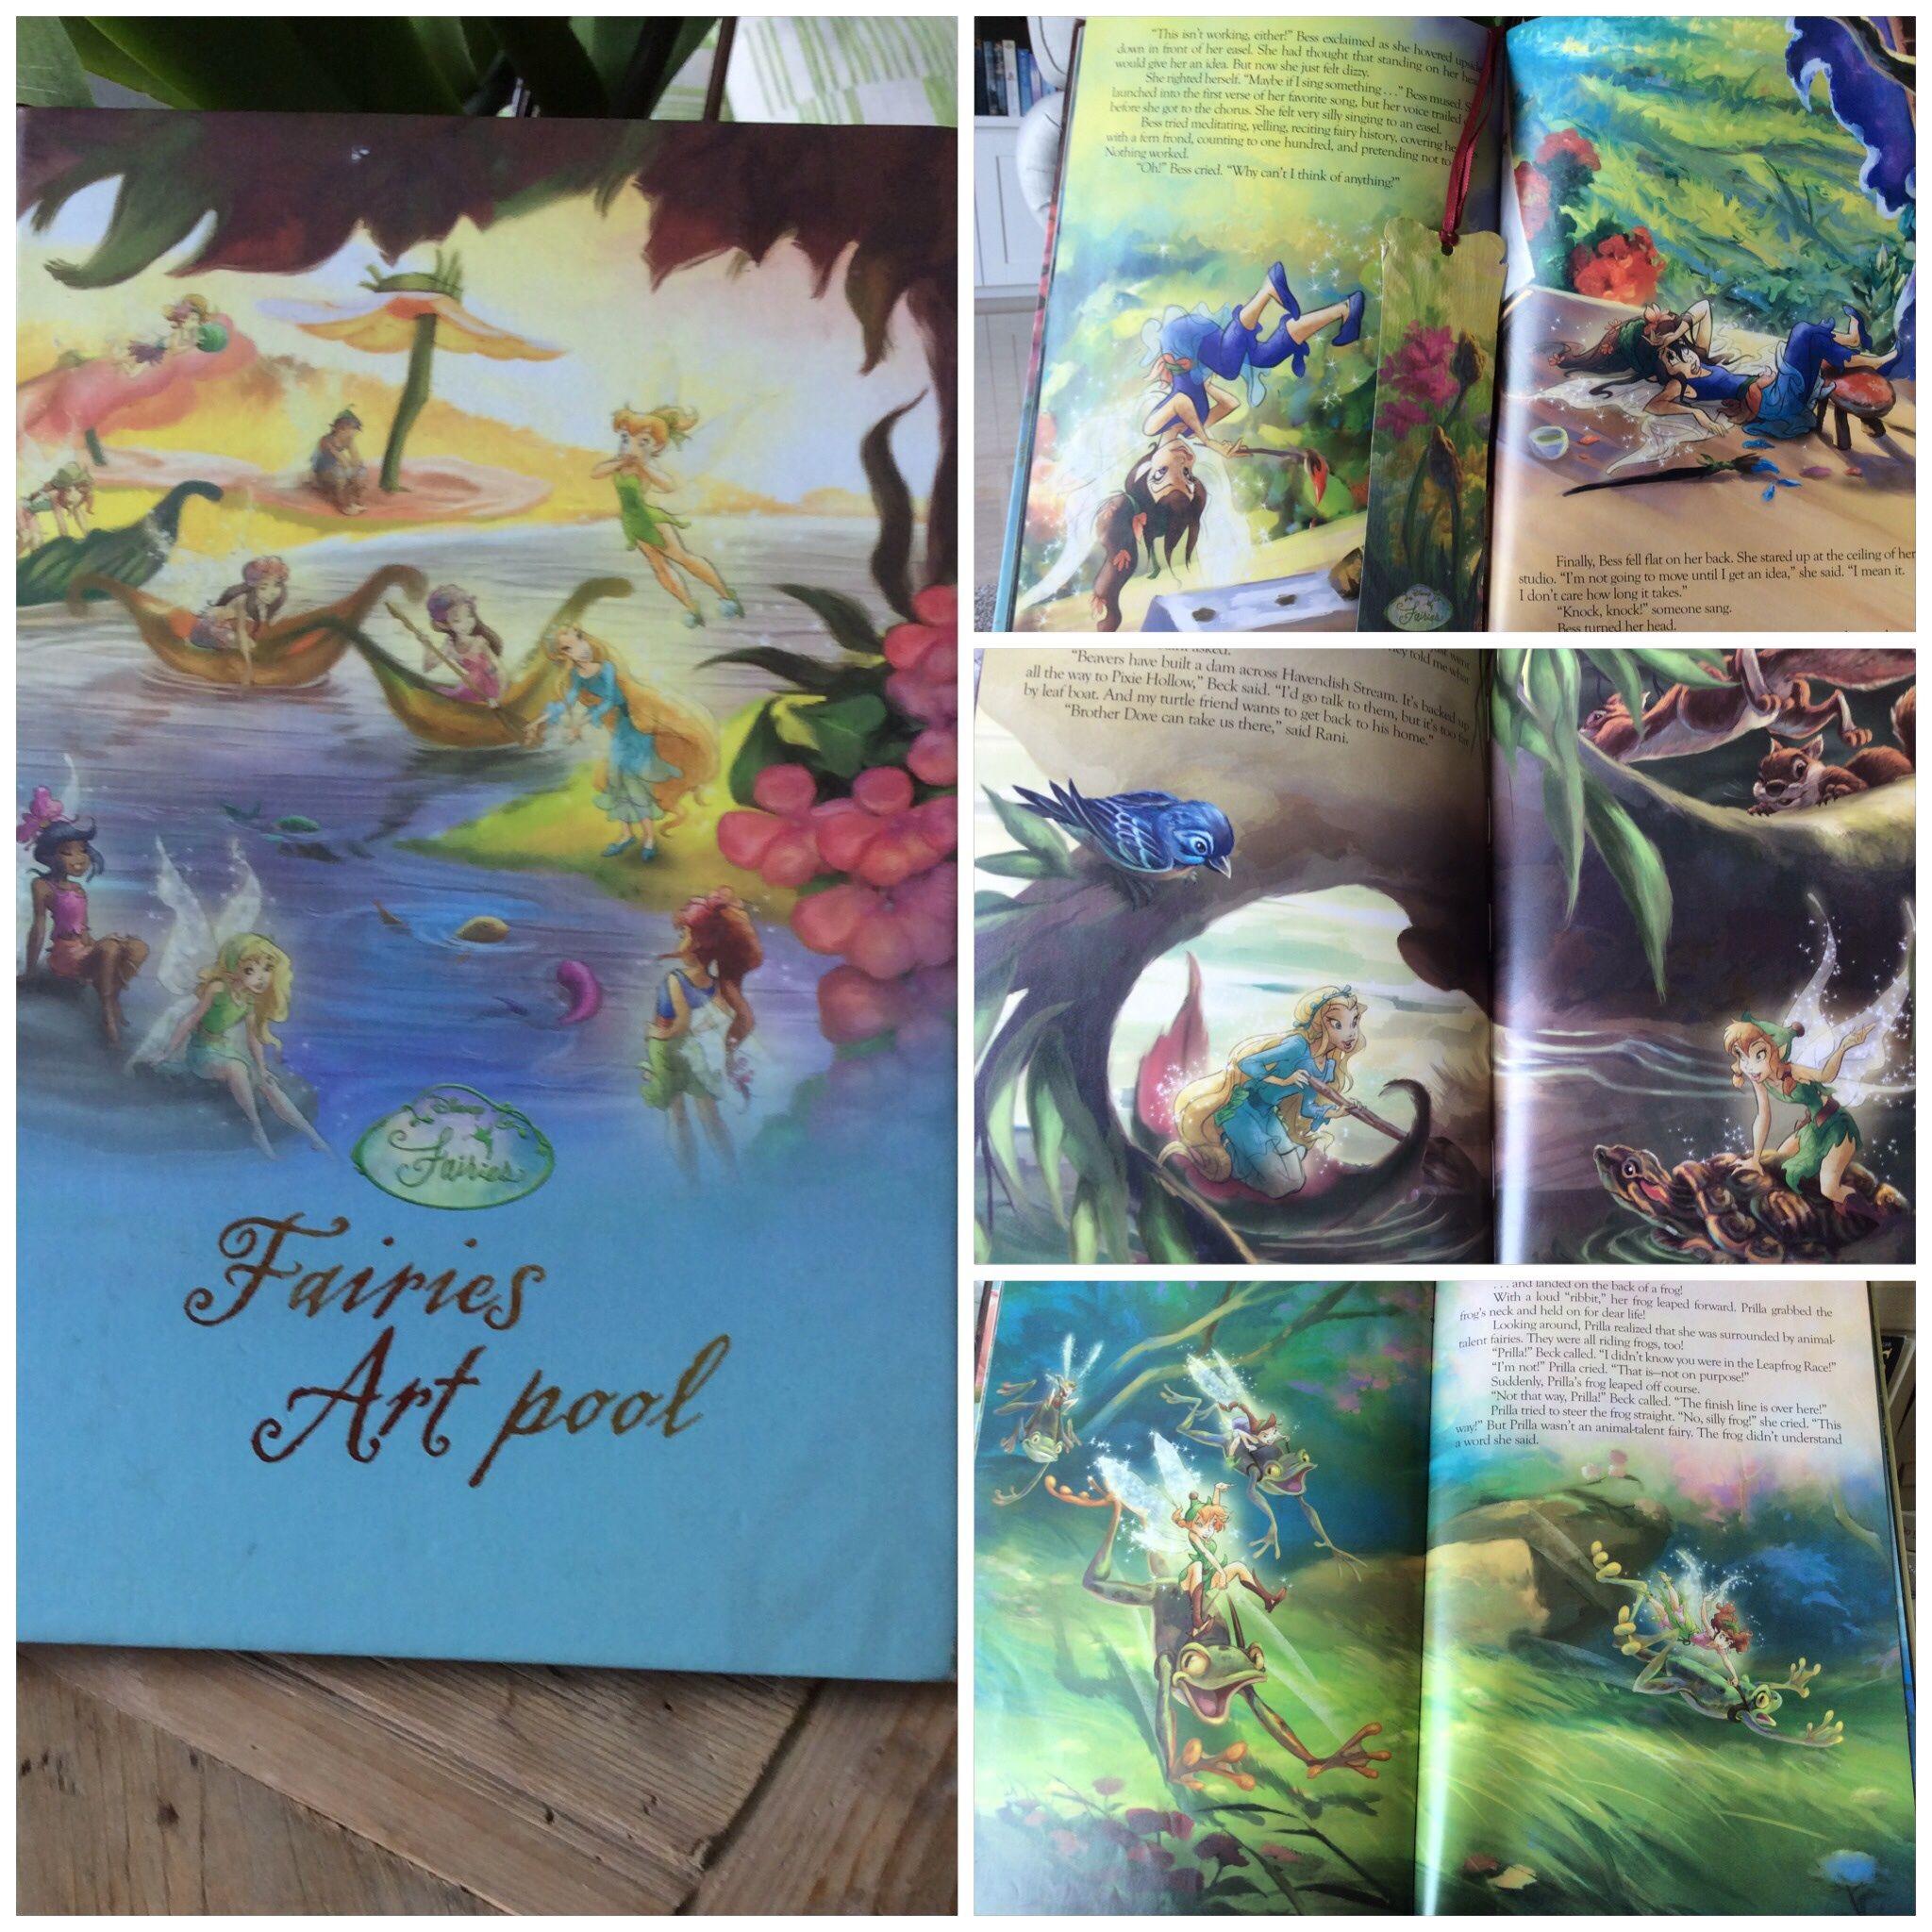 Disney fairies fairies art pool for 8 12 year olds 96